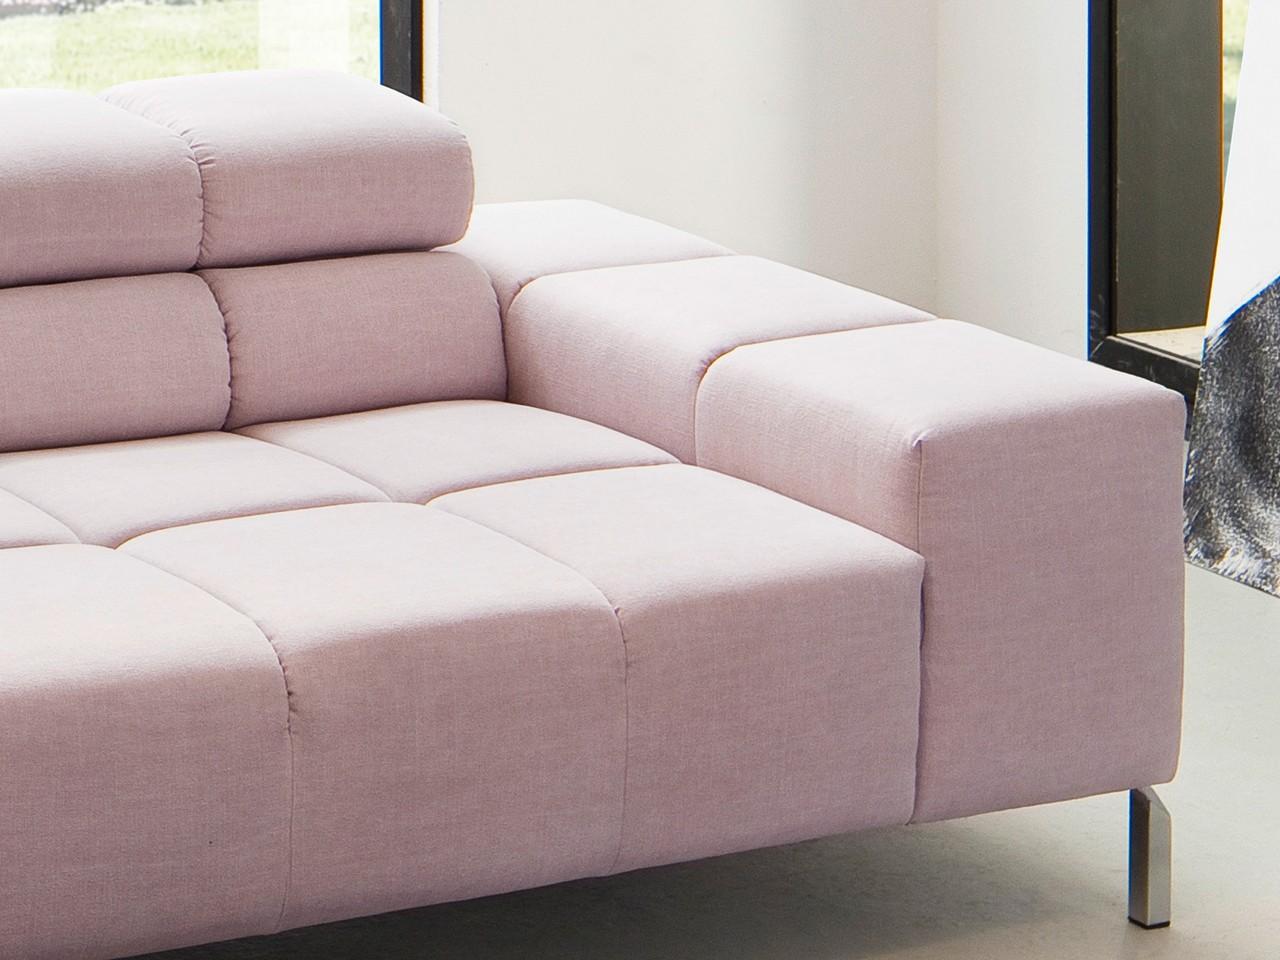 Wilo 4-Sitzer Sofa